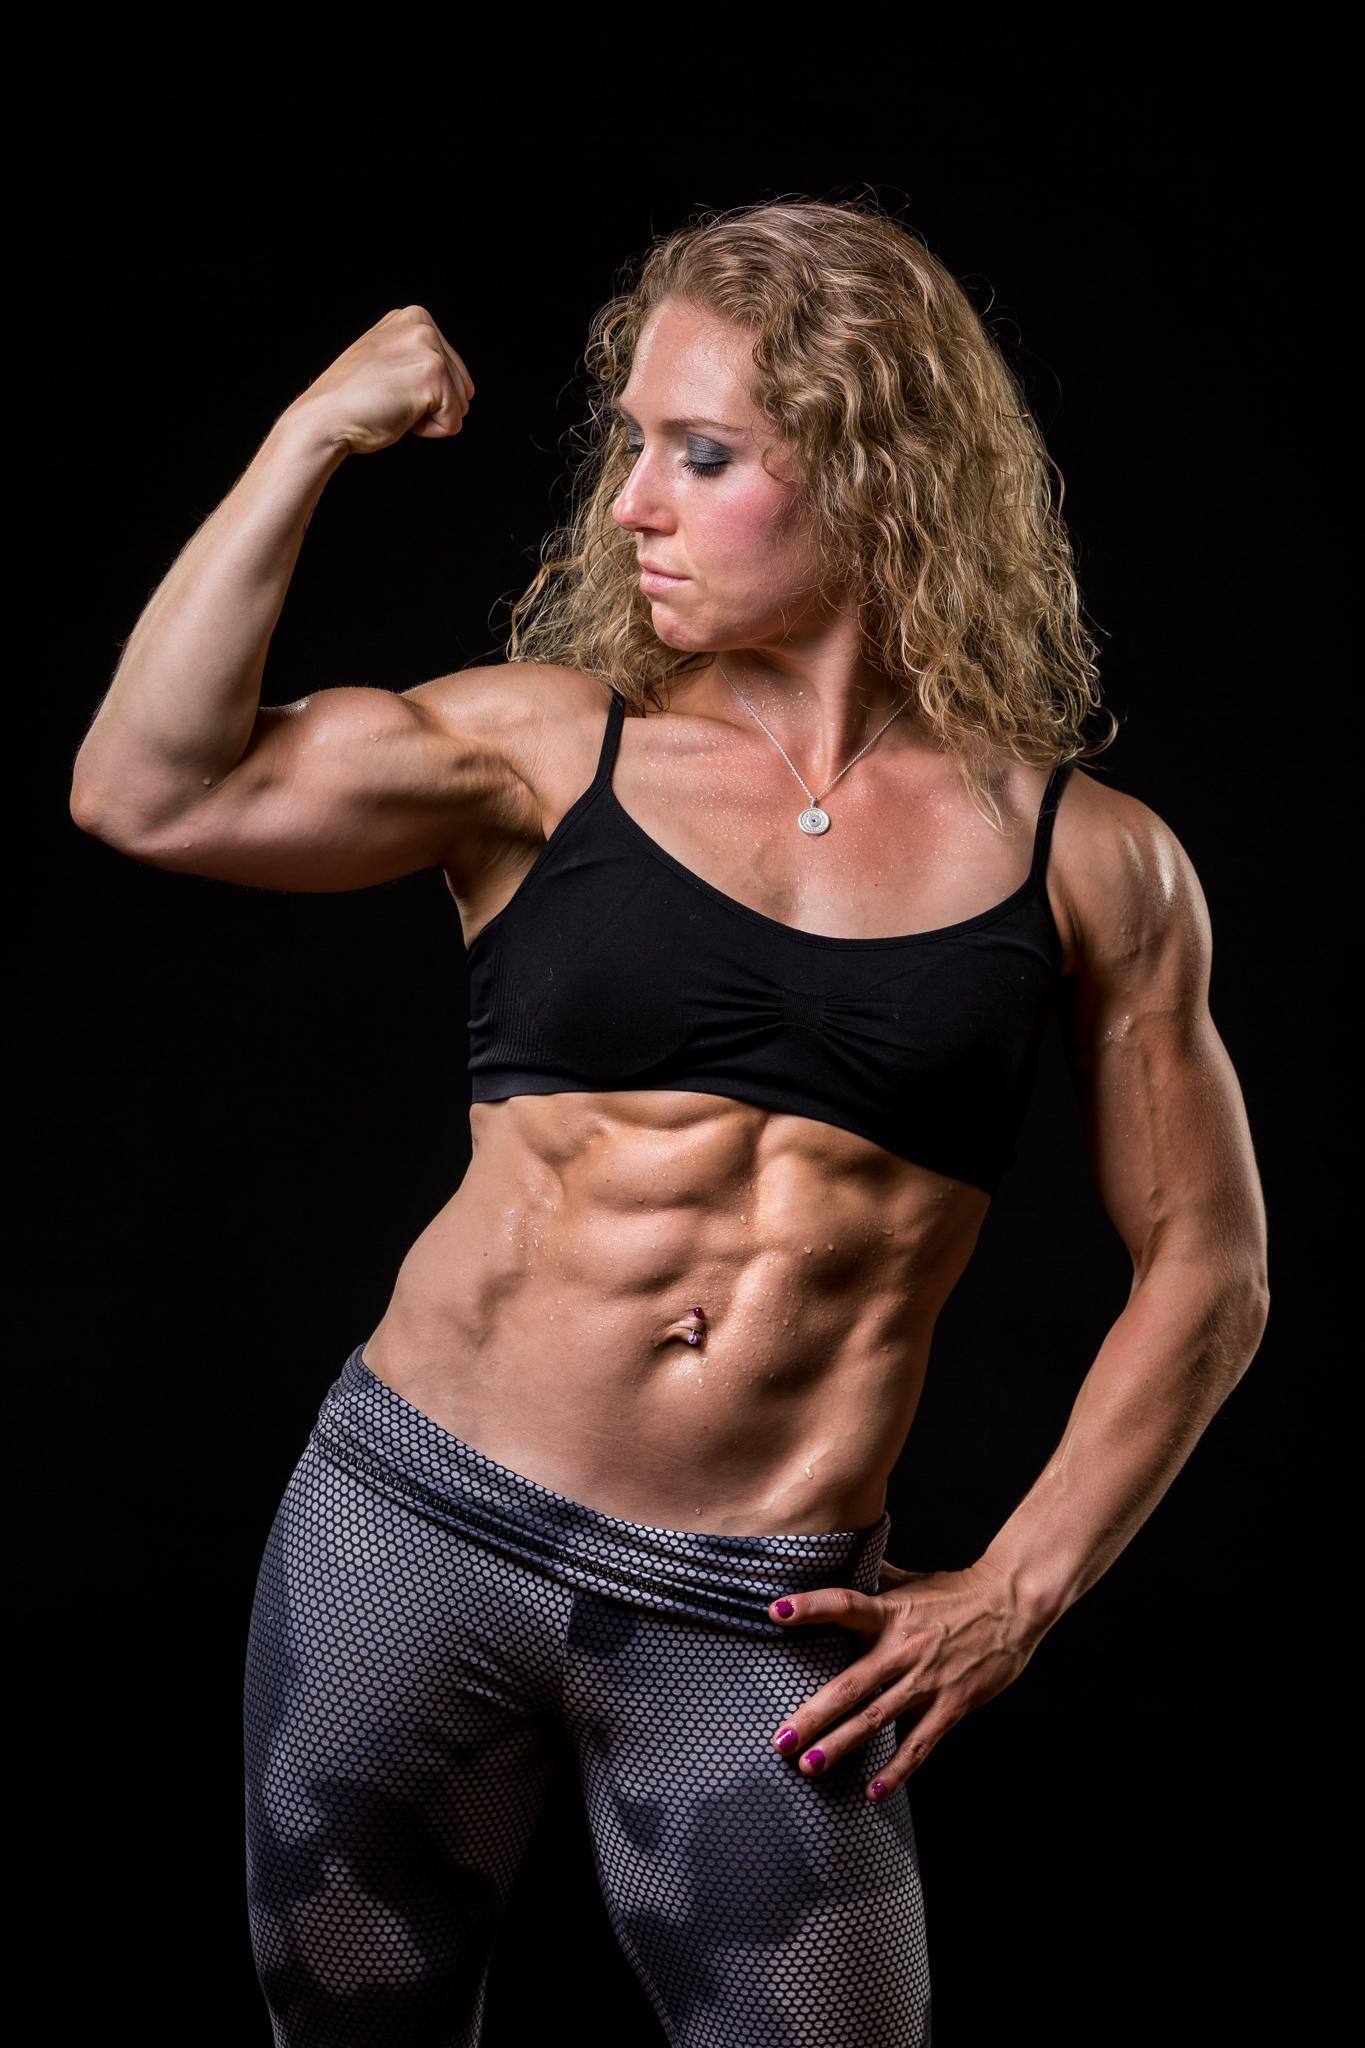 dover-new-hampshire-boston-fitness-photographer-photography-studio-01-3.jpg